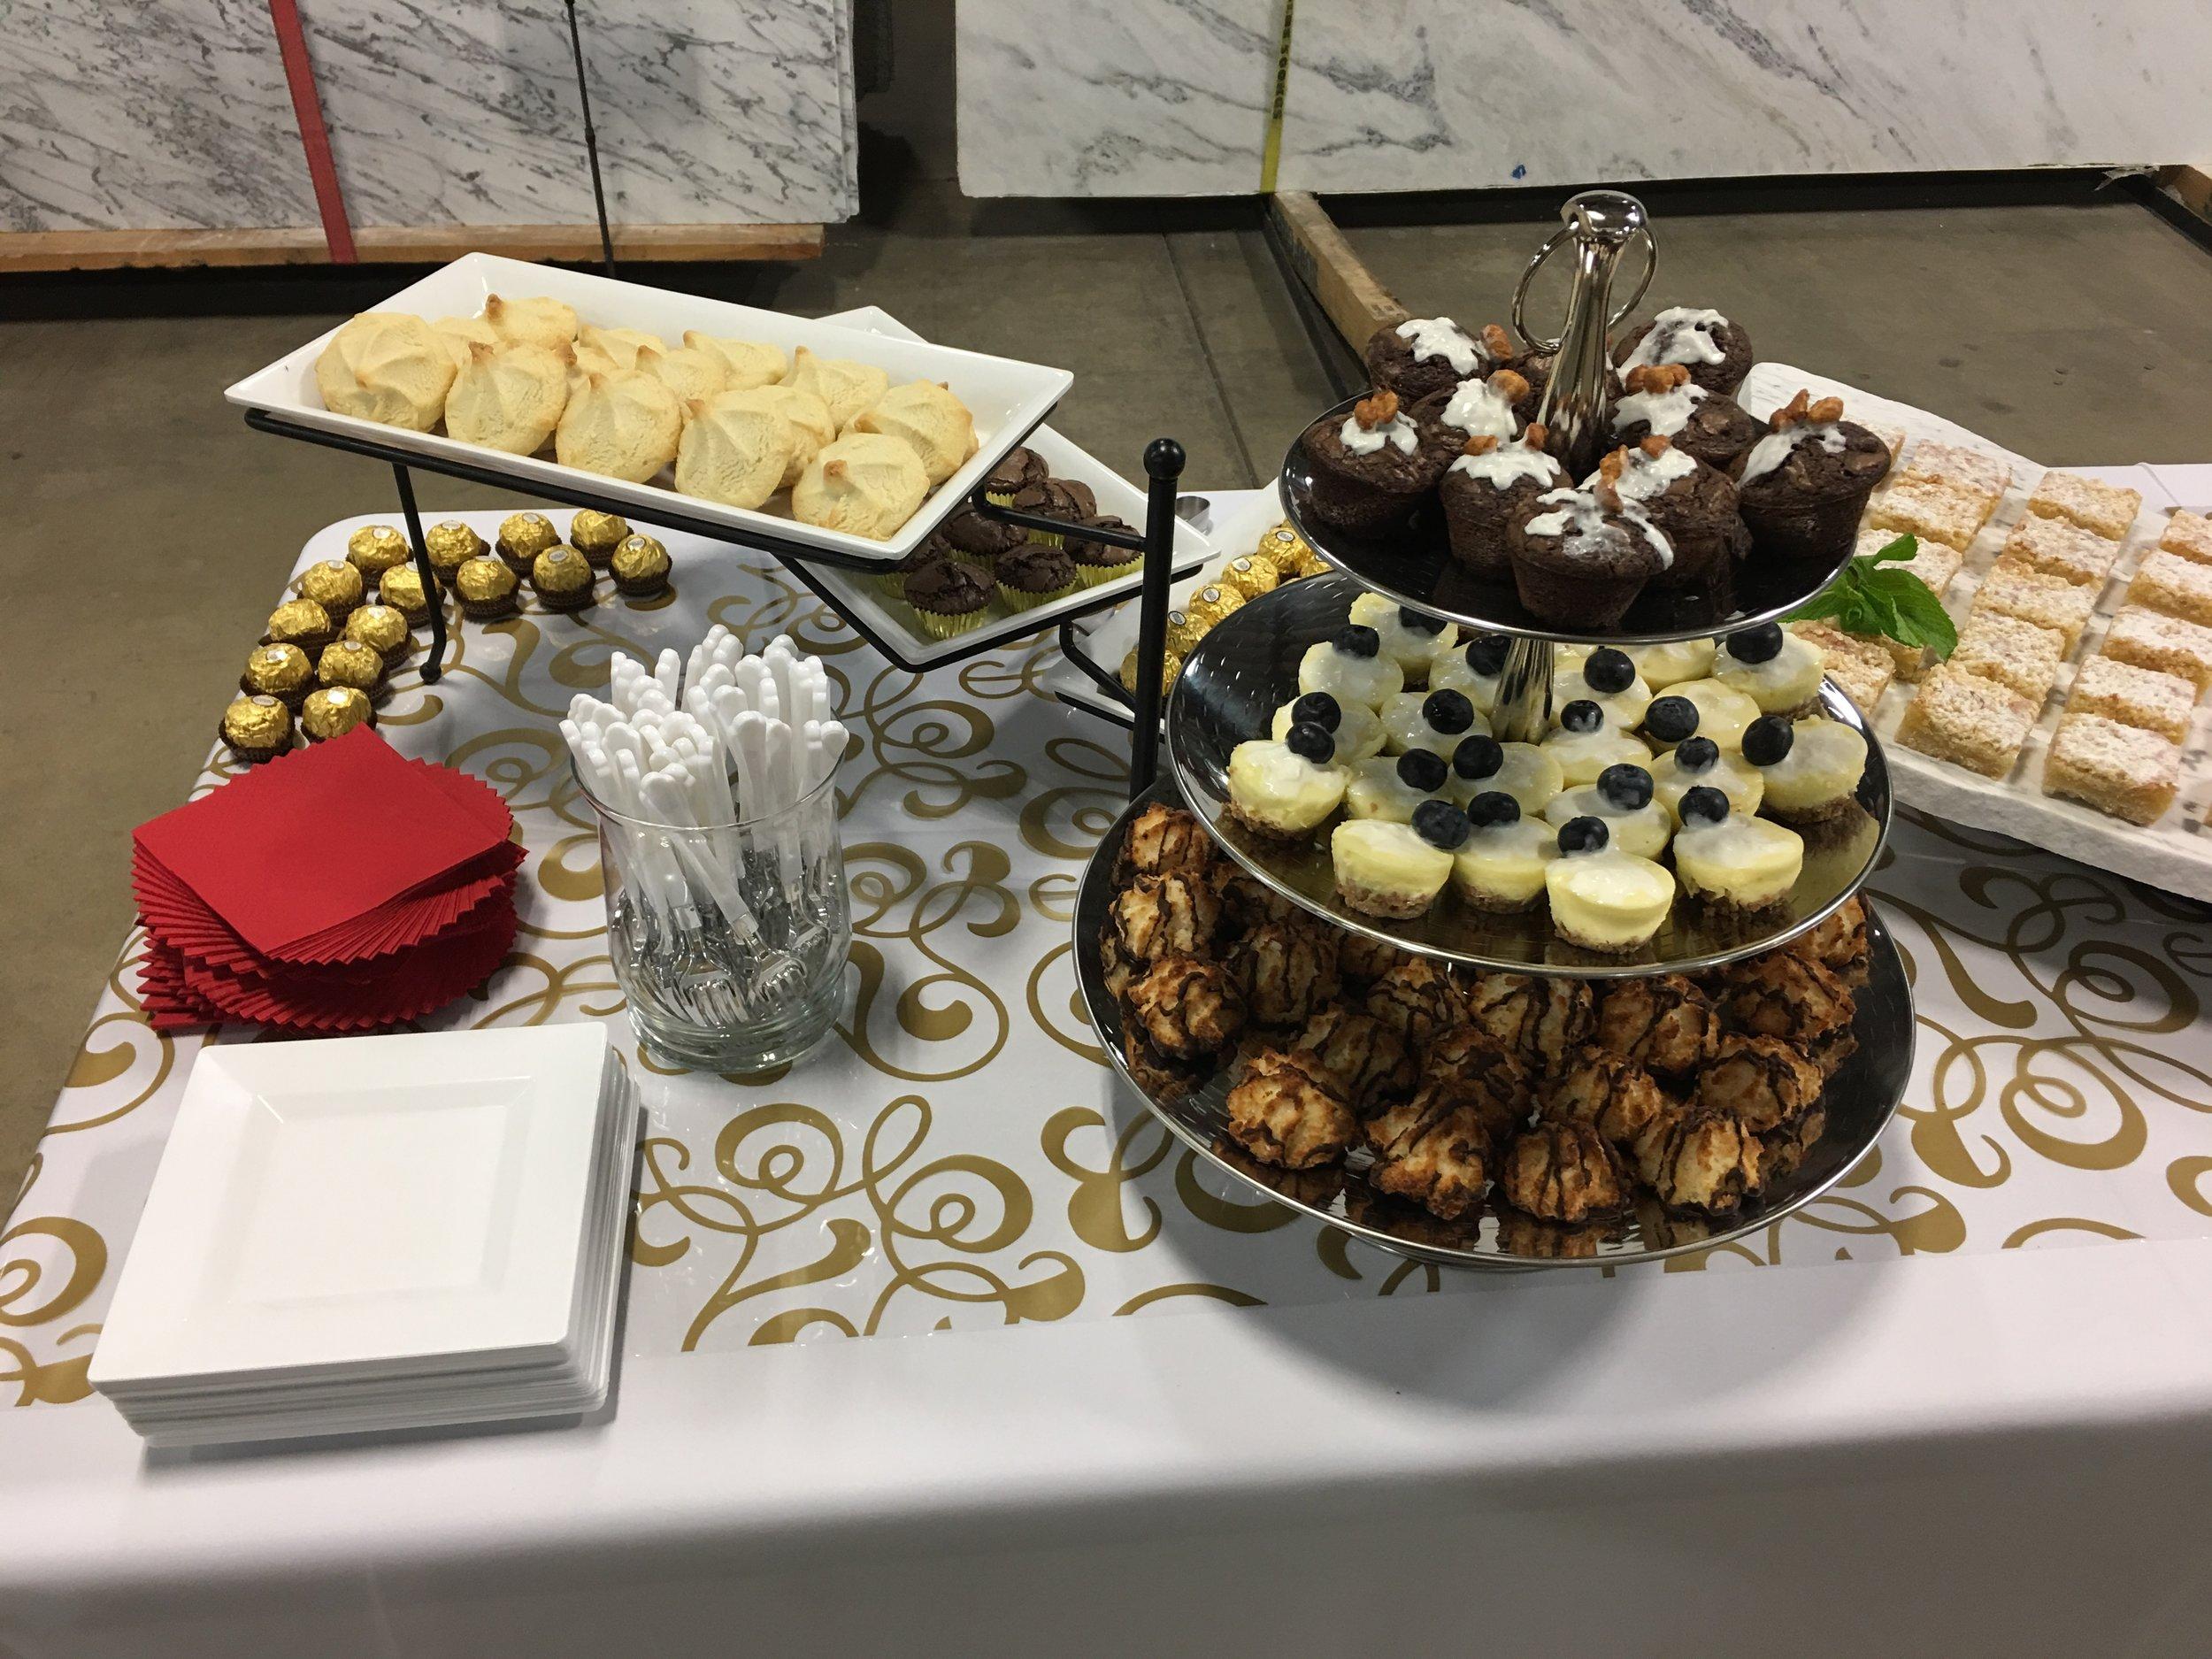 Daltile_Desserts 2.JPG